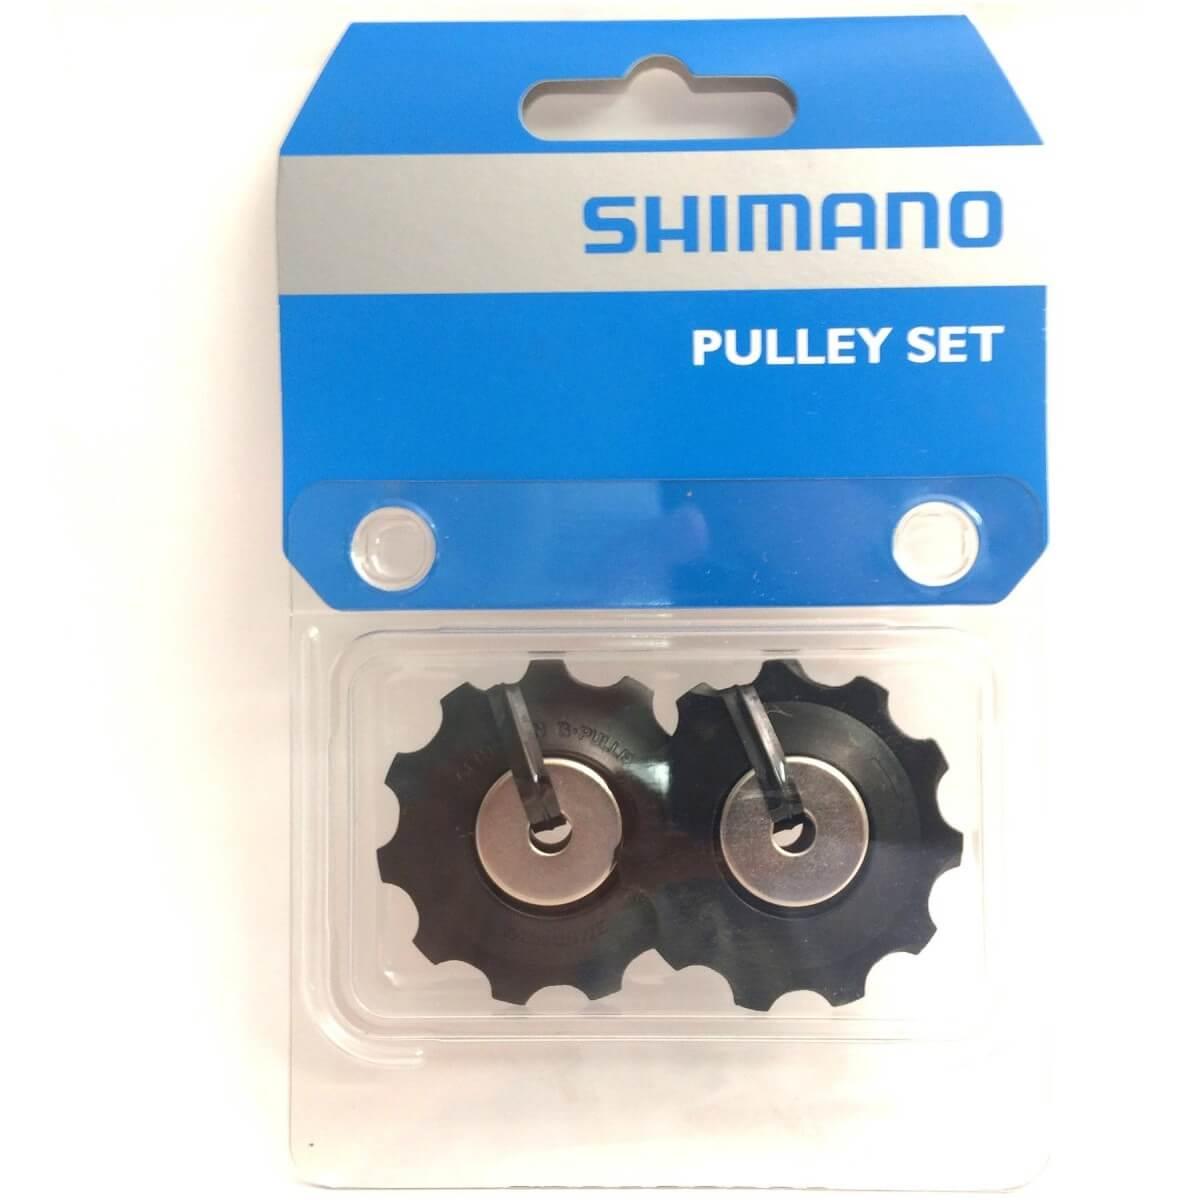 Roldanas de cambio Shimano de 10 velocidades para 105 RD-5700/Deore/SLX